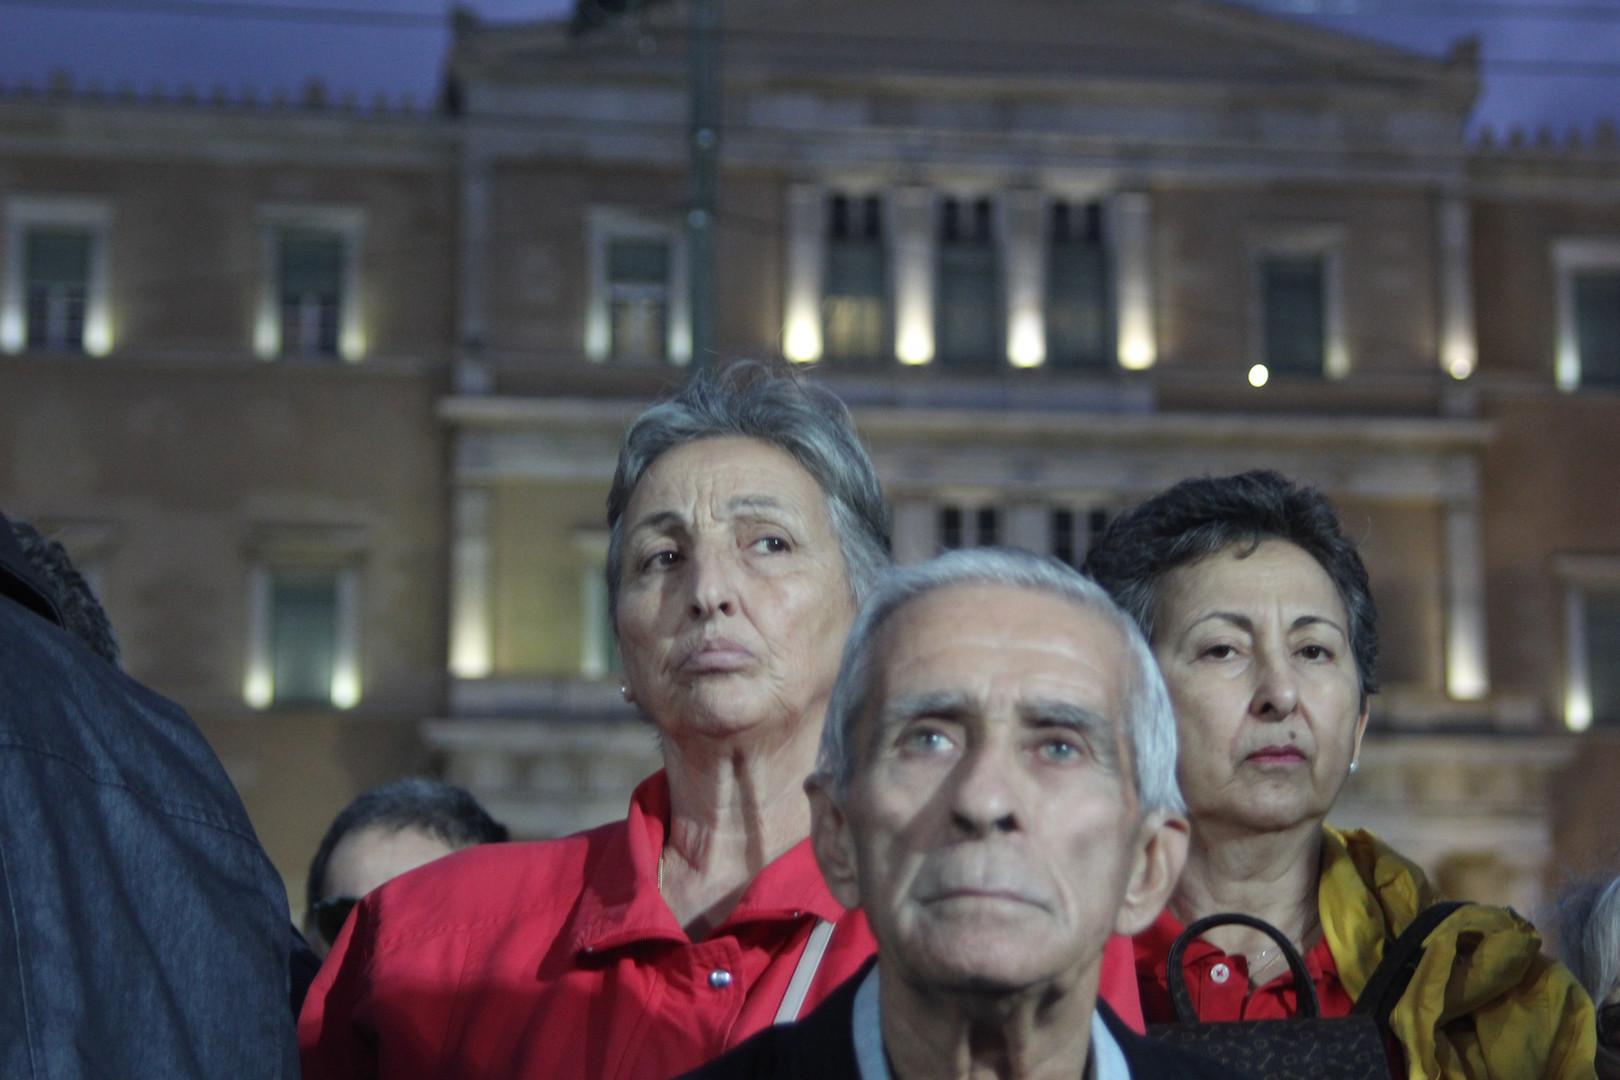 Greek protestors against migrants